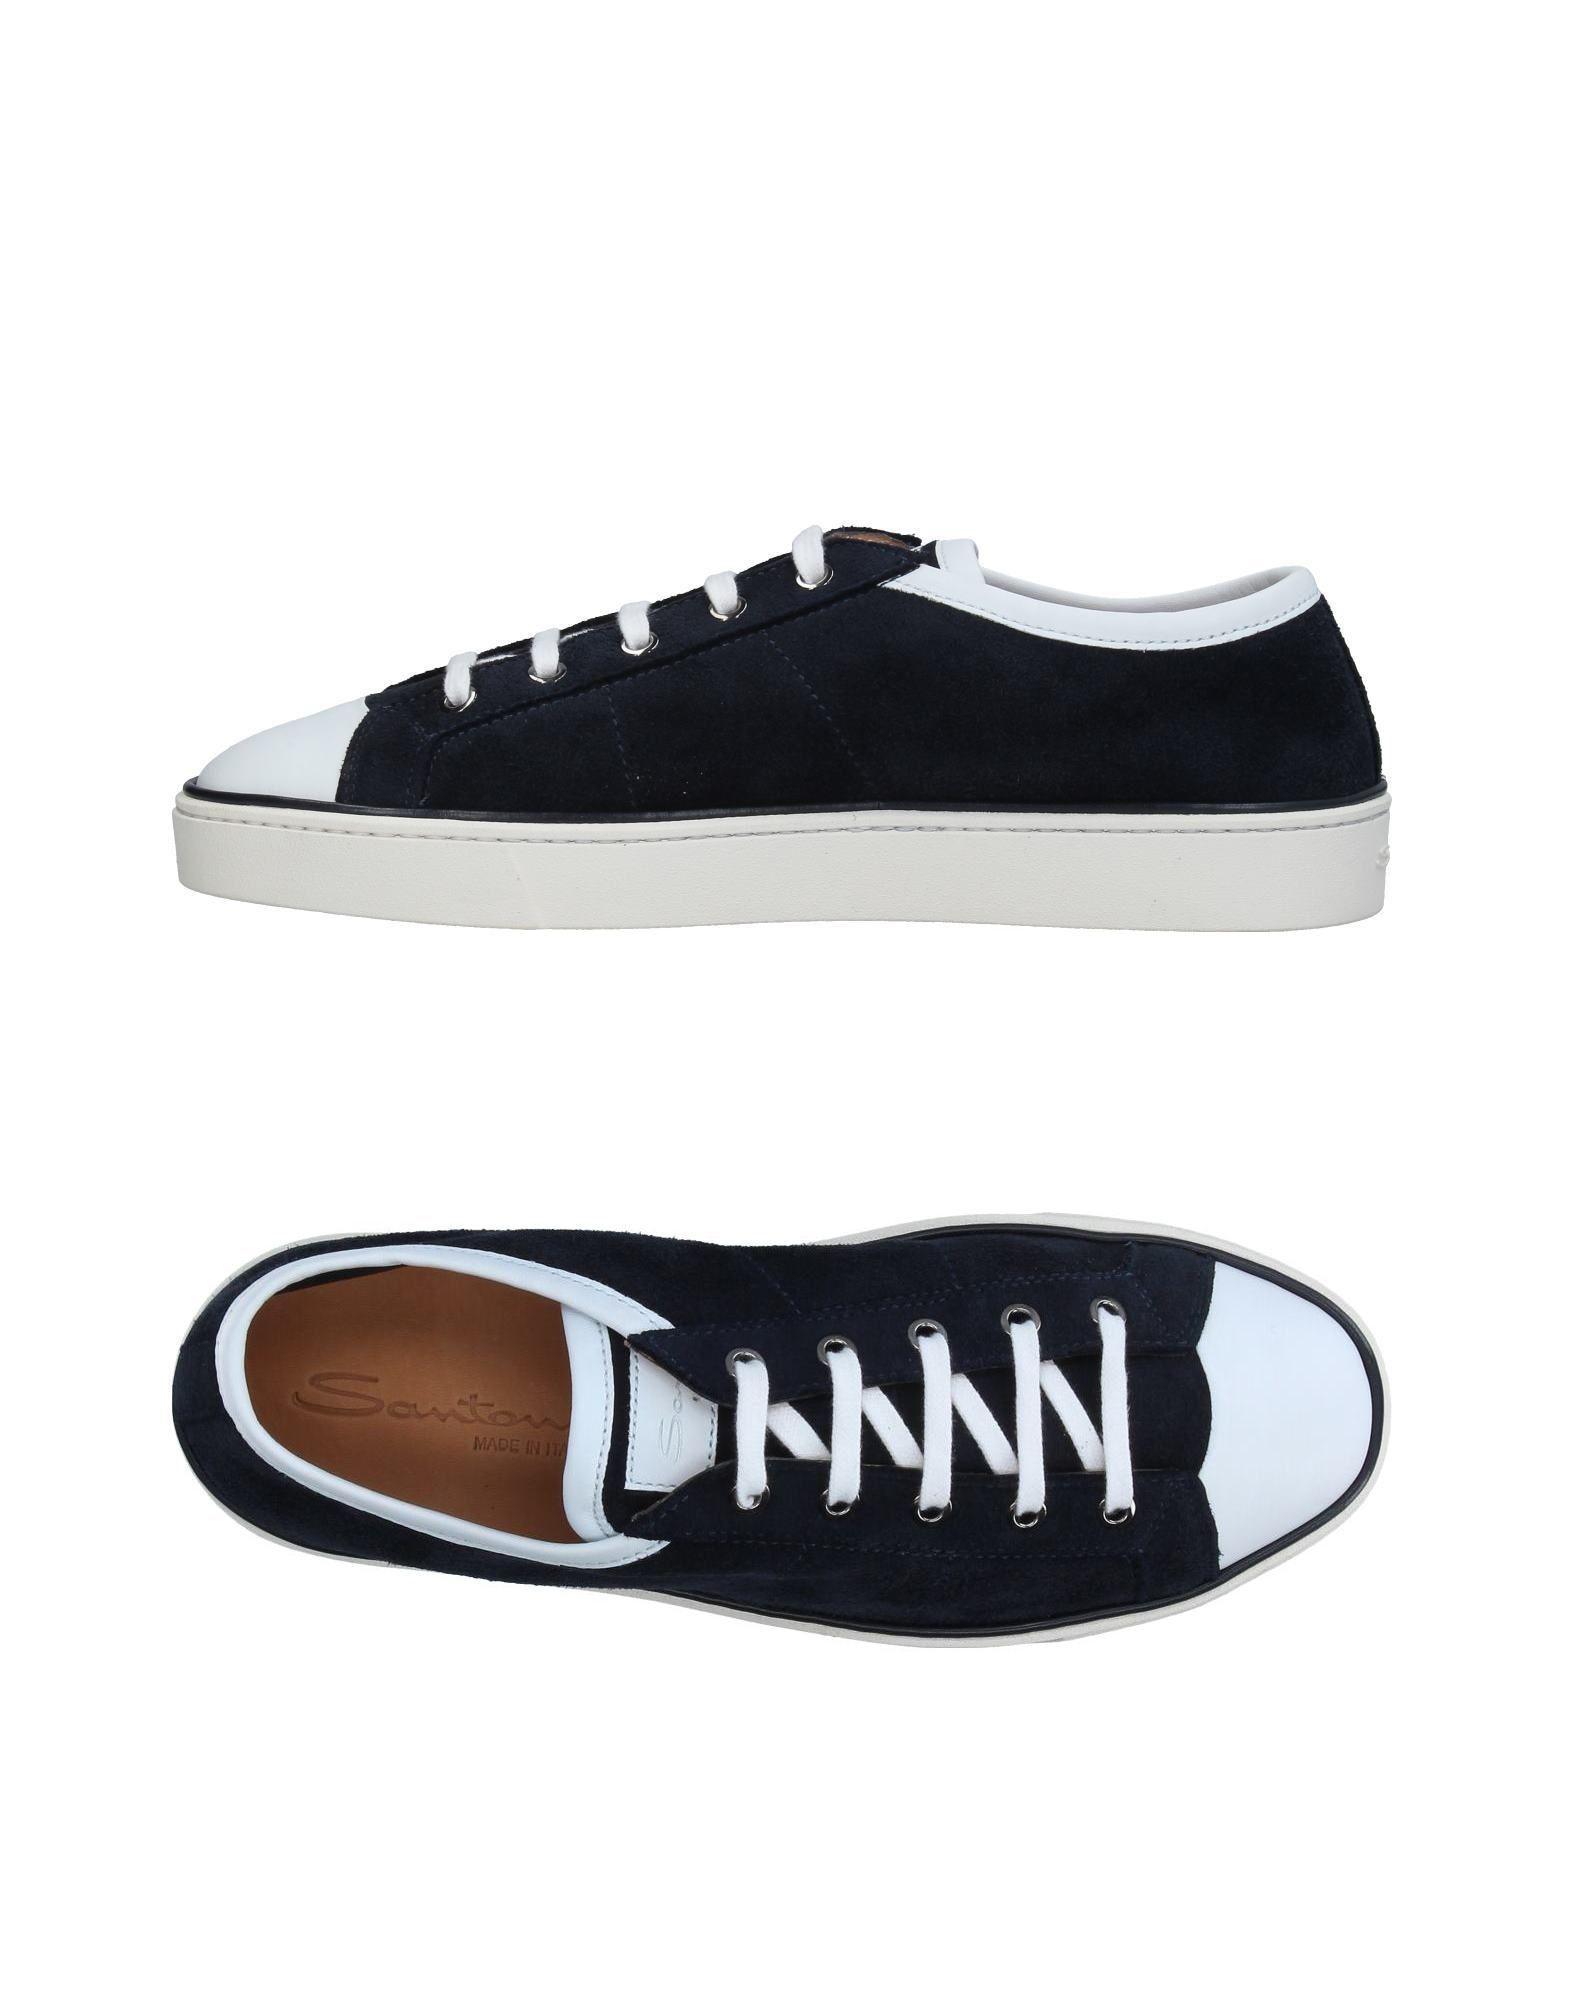 santoni low tops sneakers in black lyst. Black Bedroom Furniture Sets. Home Design Ideas